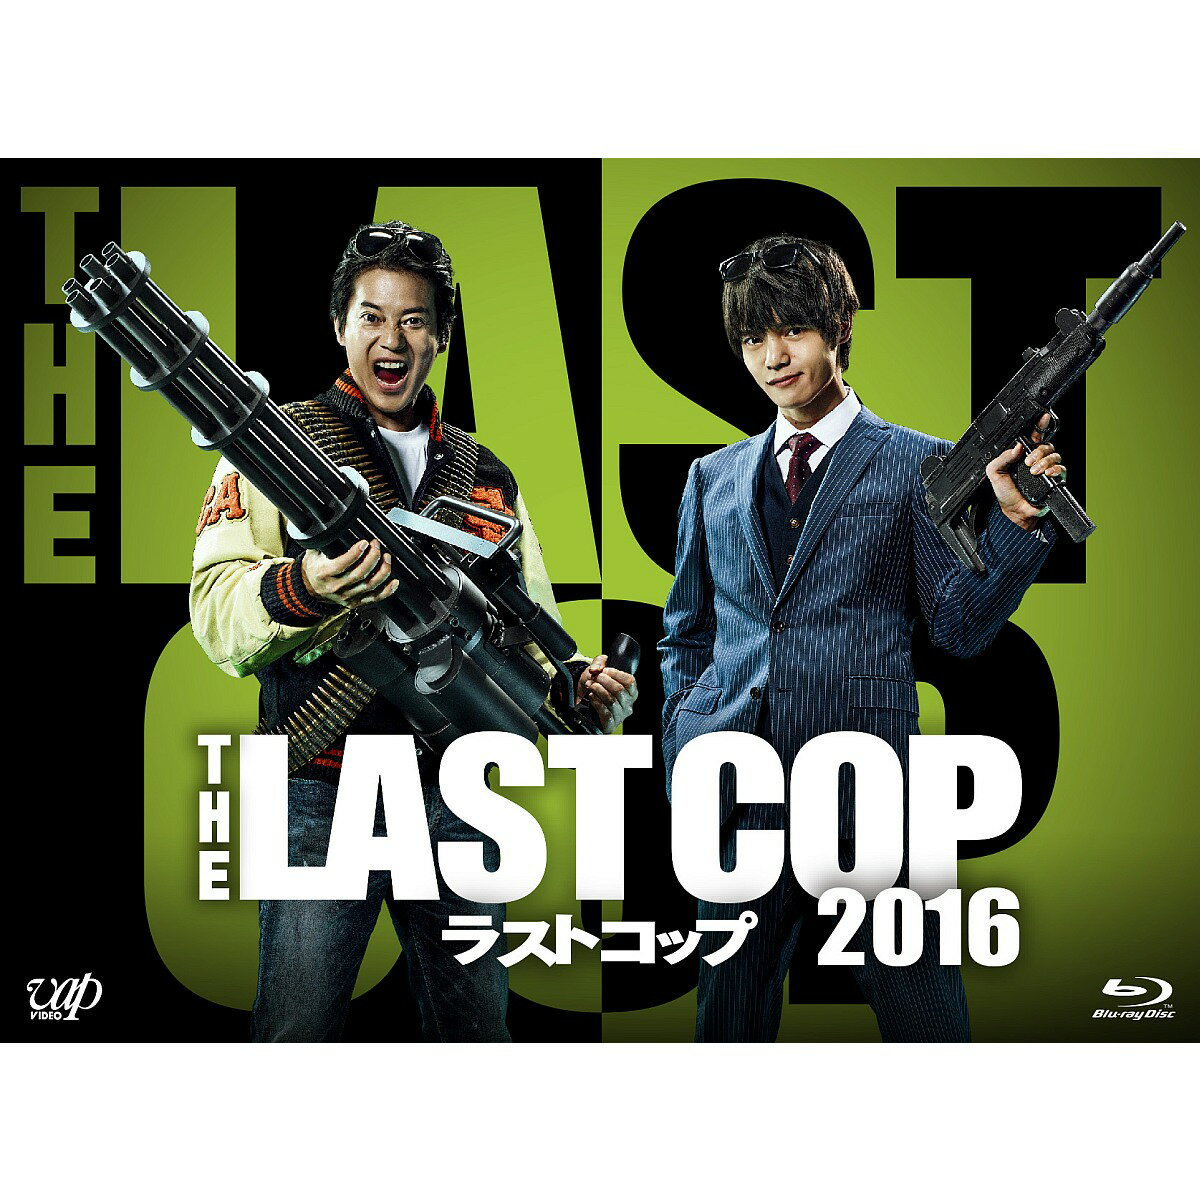 THE LAST COP ラストコップ 2016 Blu-ray BOX【Blu-ray】 [ 唐沢寿明 ]